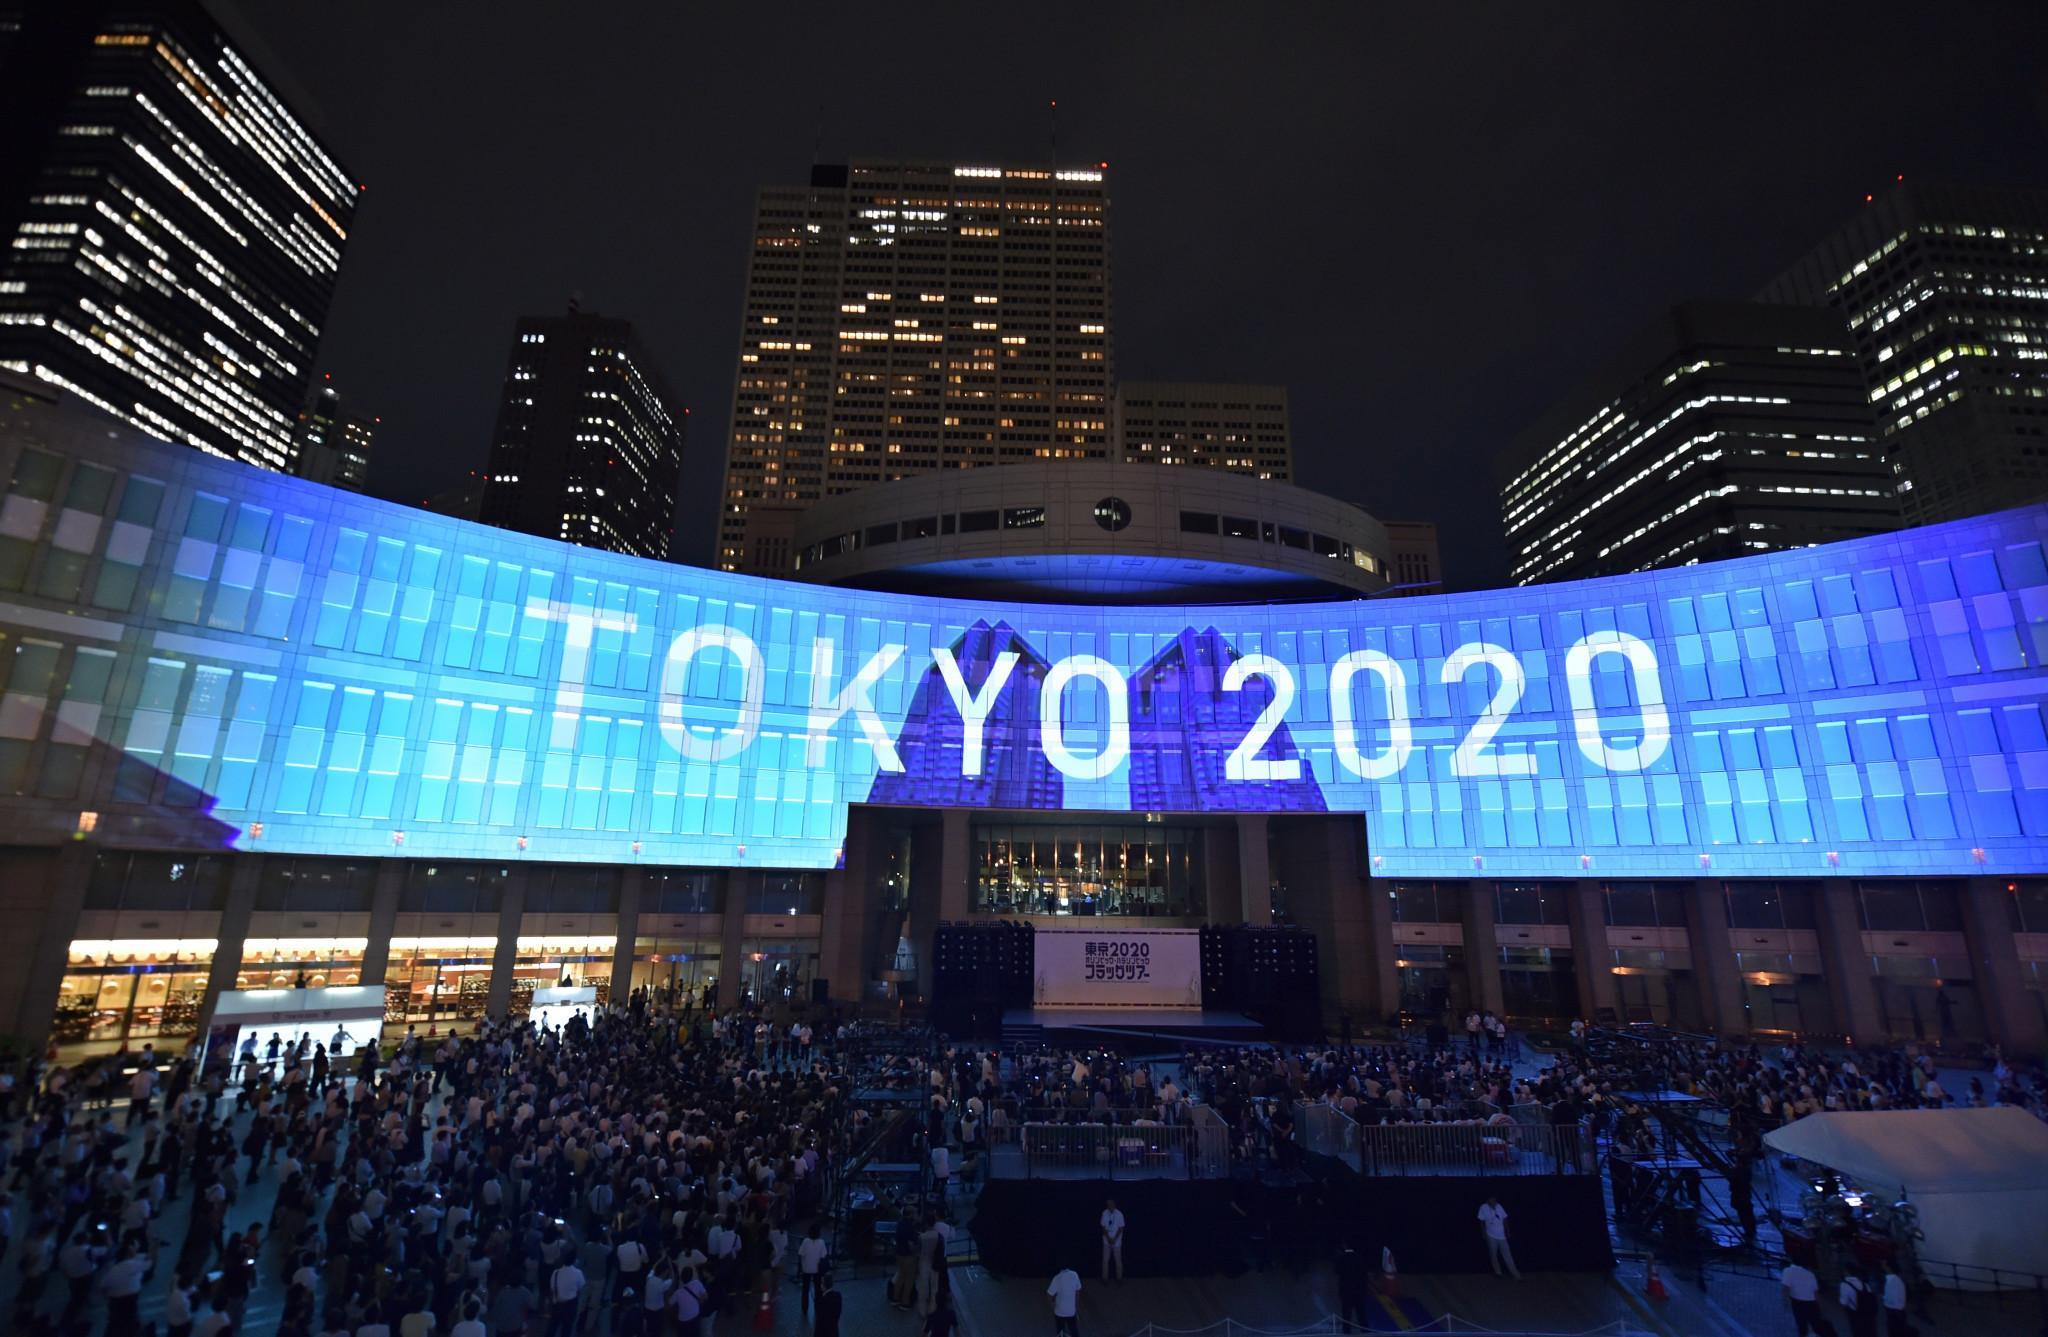 National Olympic Committees visit Tokyo 2020 venues